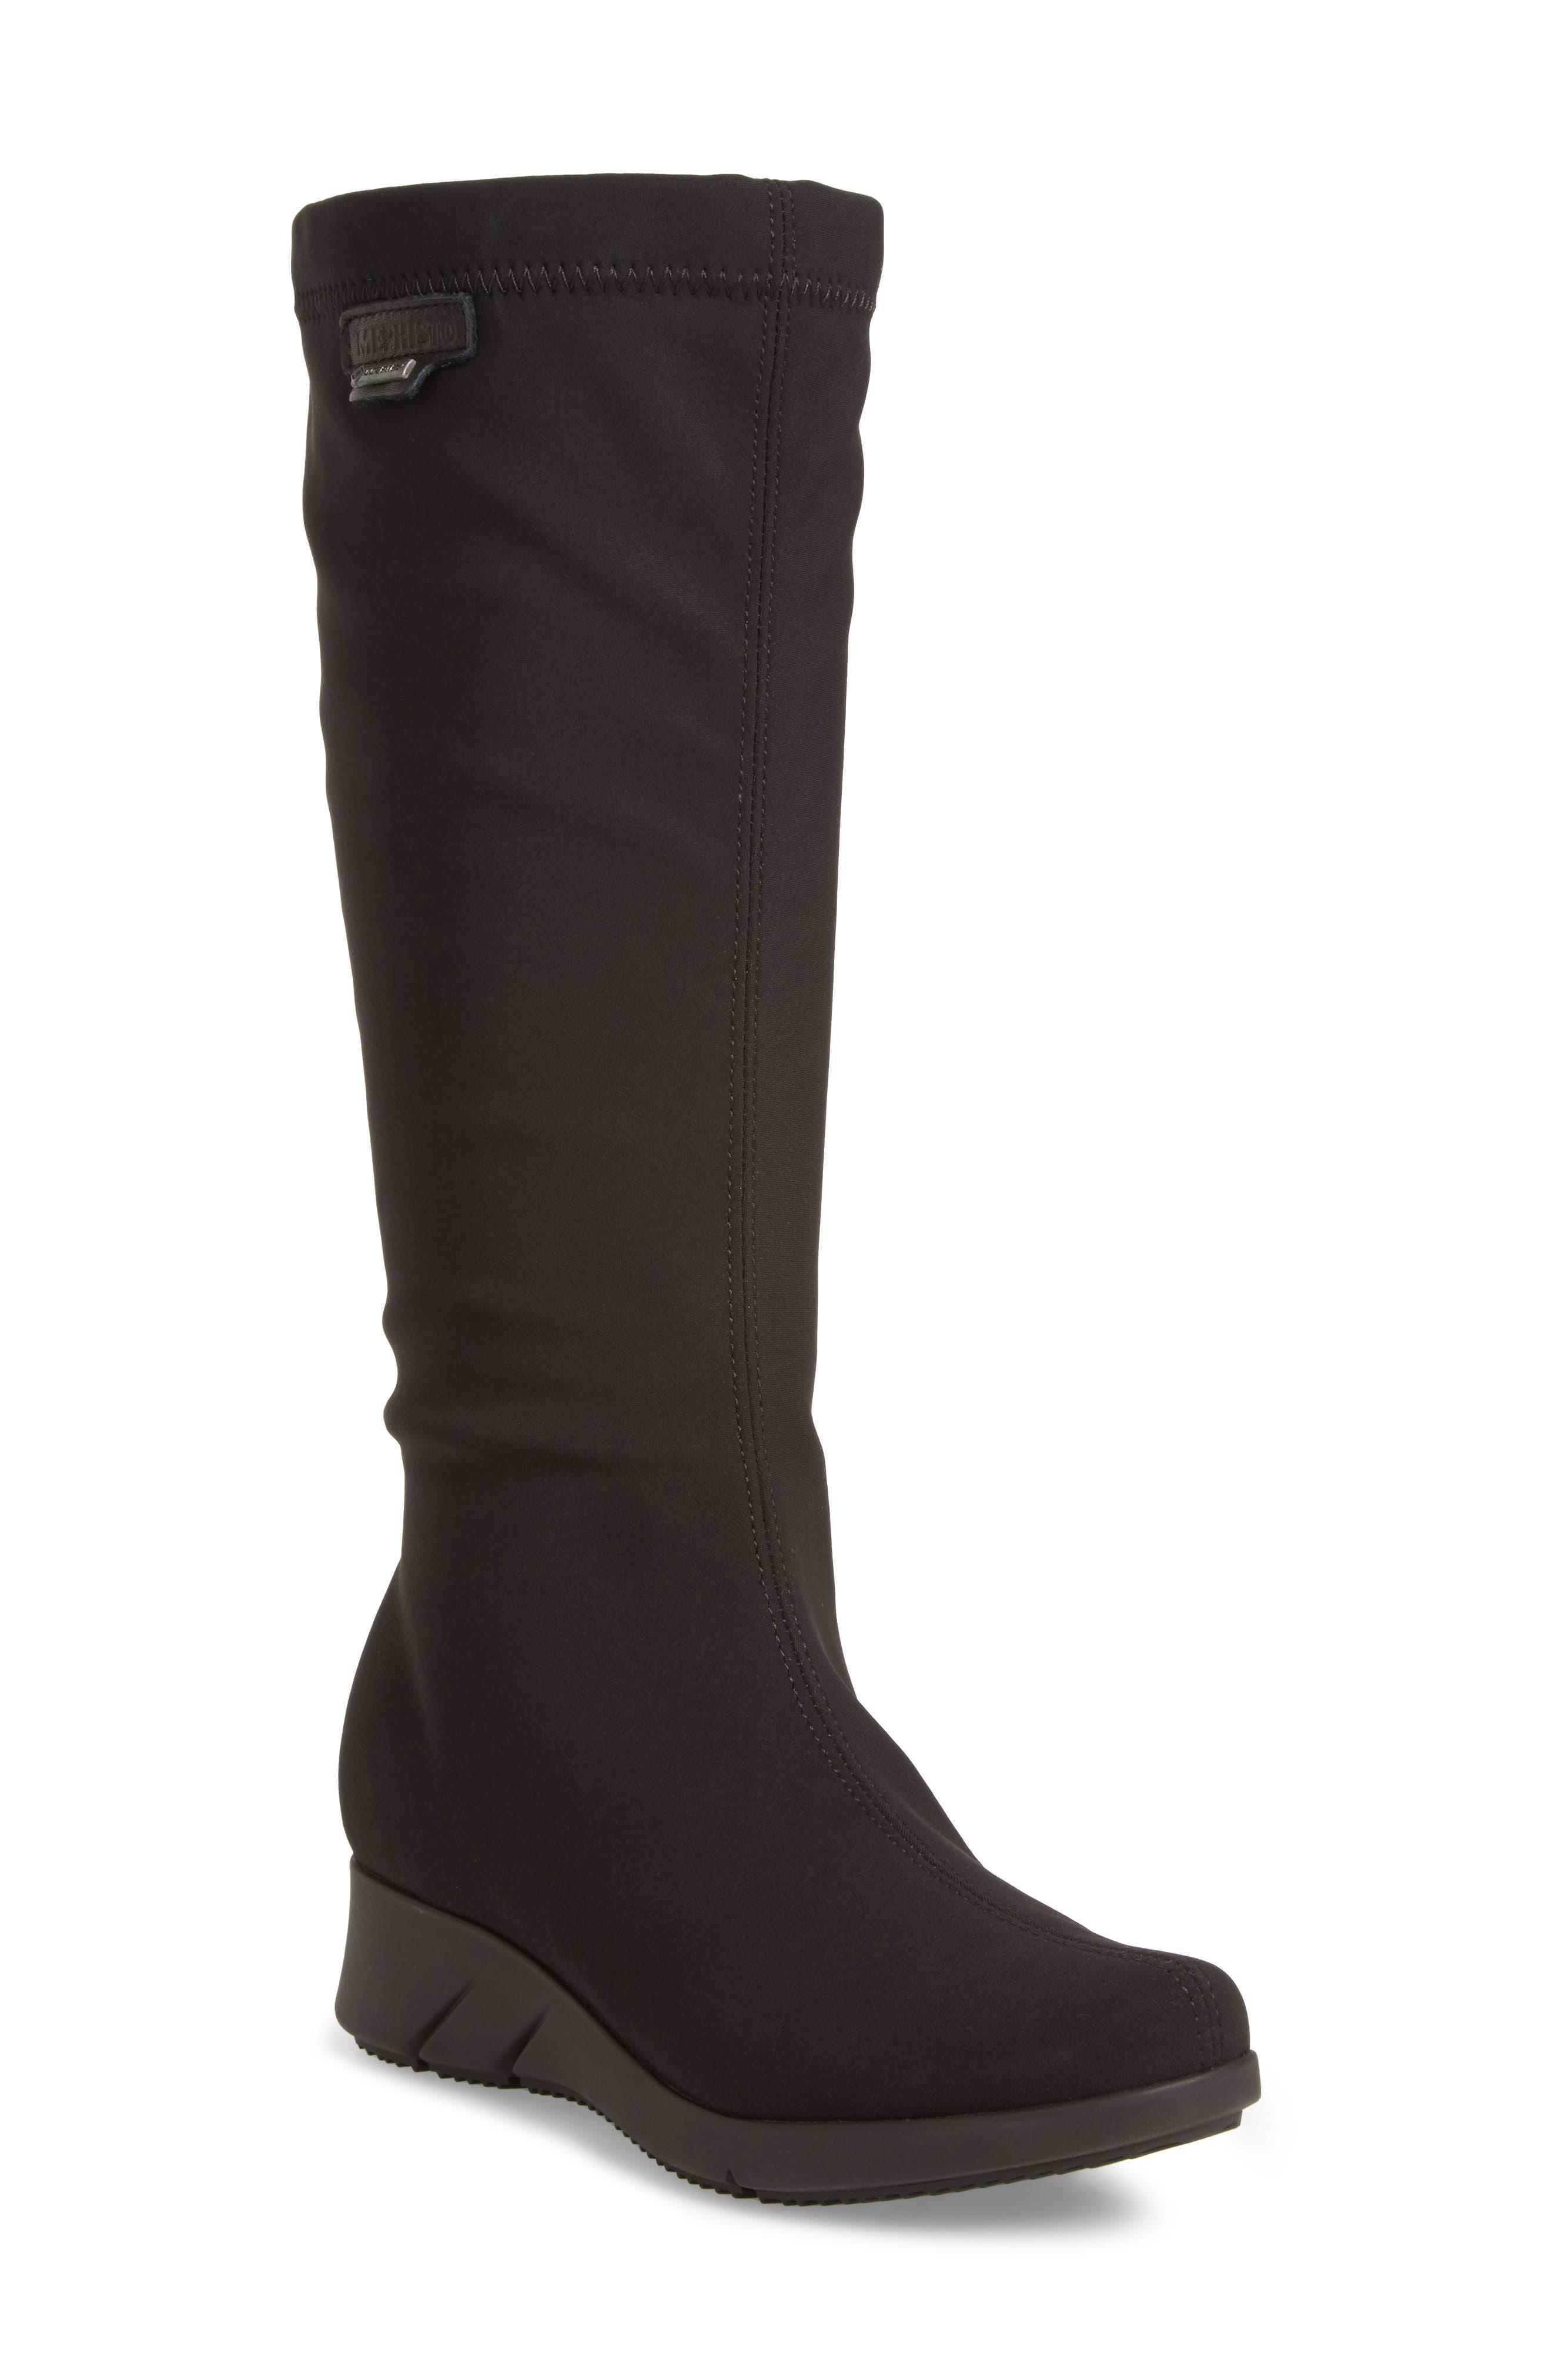 Alternate Image 1 Selected - Mephisto Minda Waterproof Wedge Boot (Women)